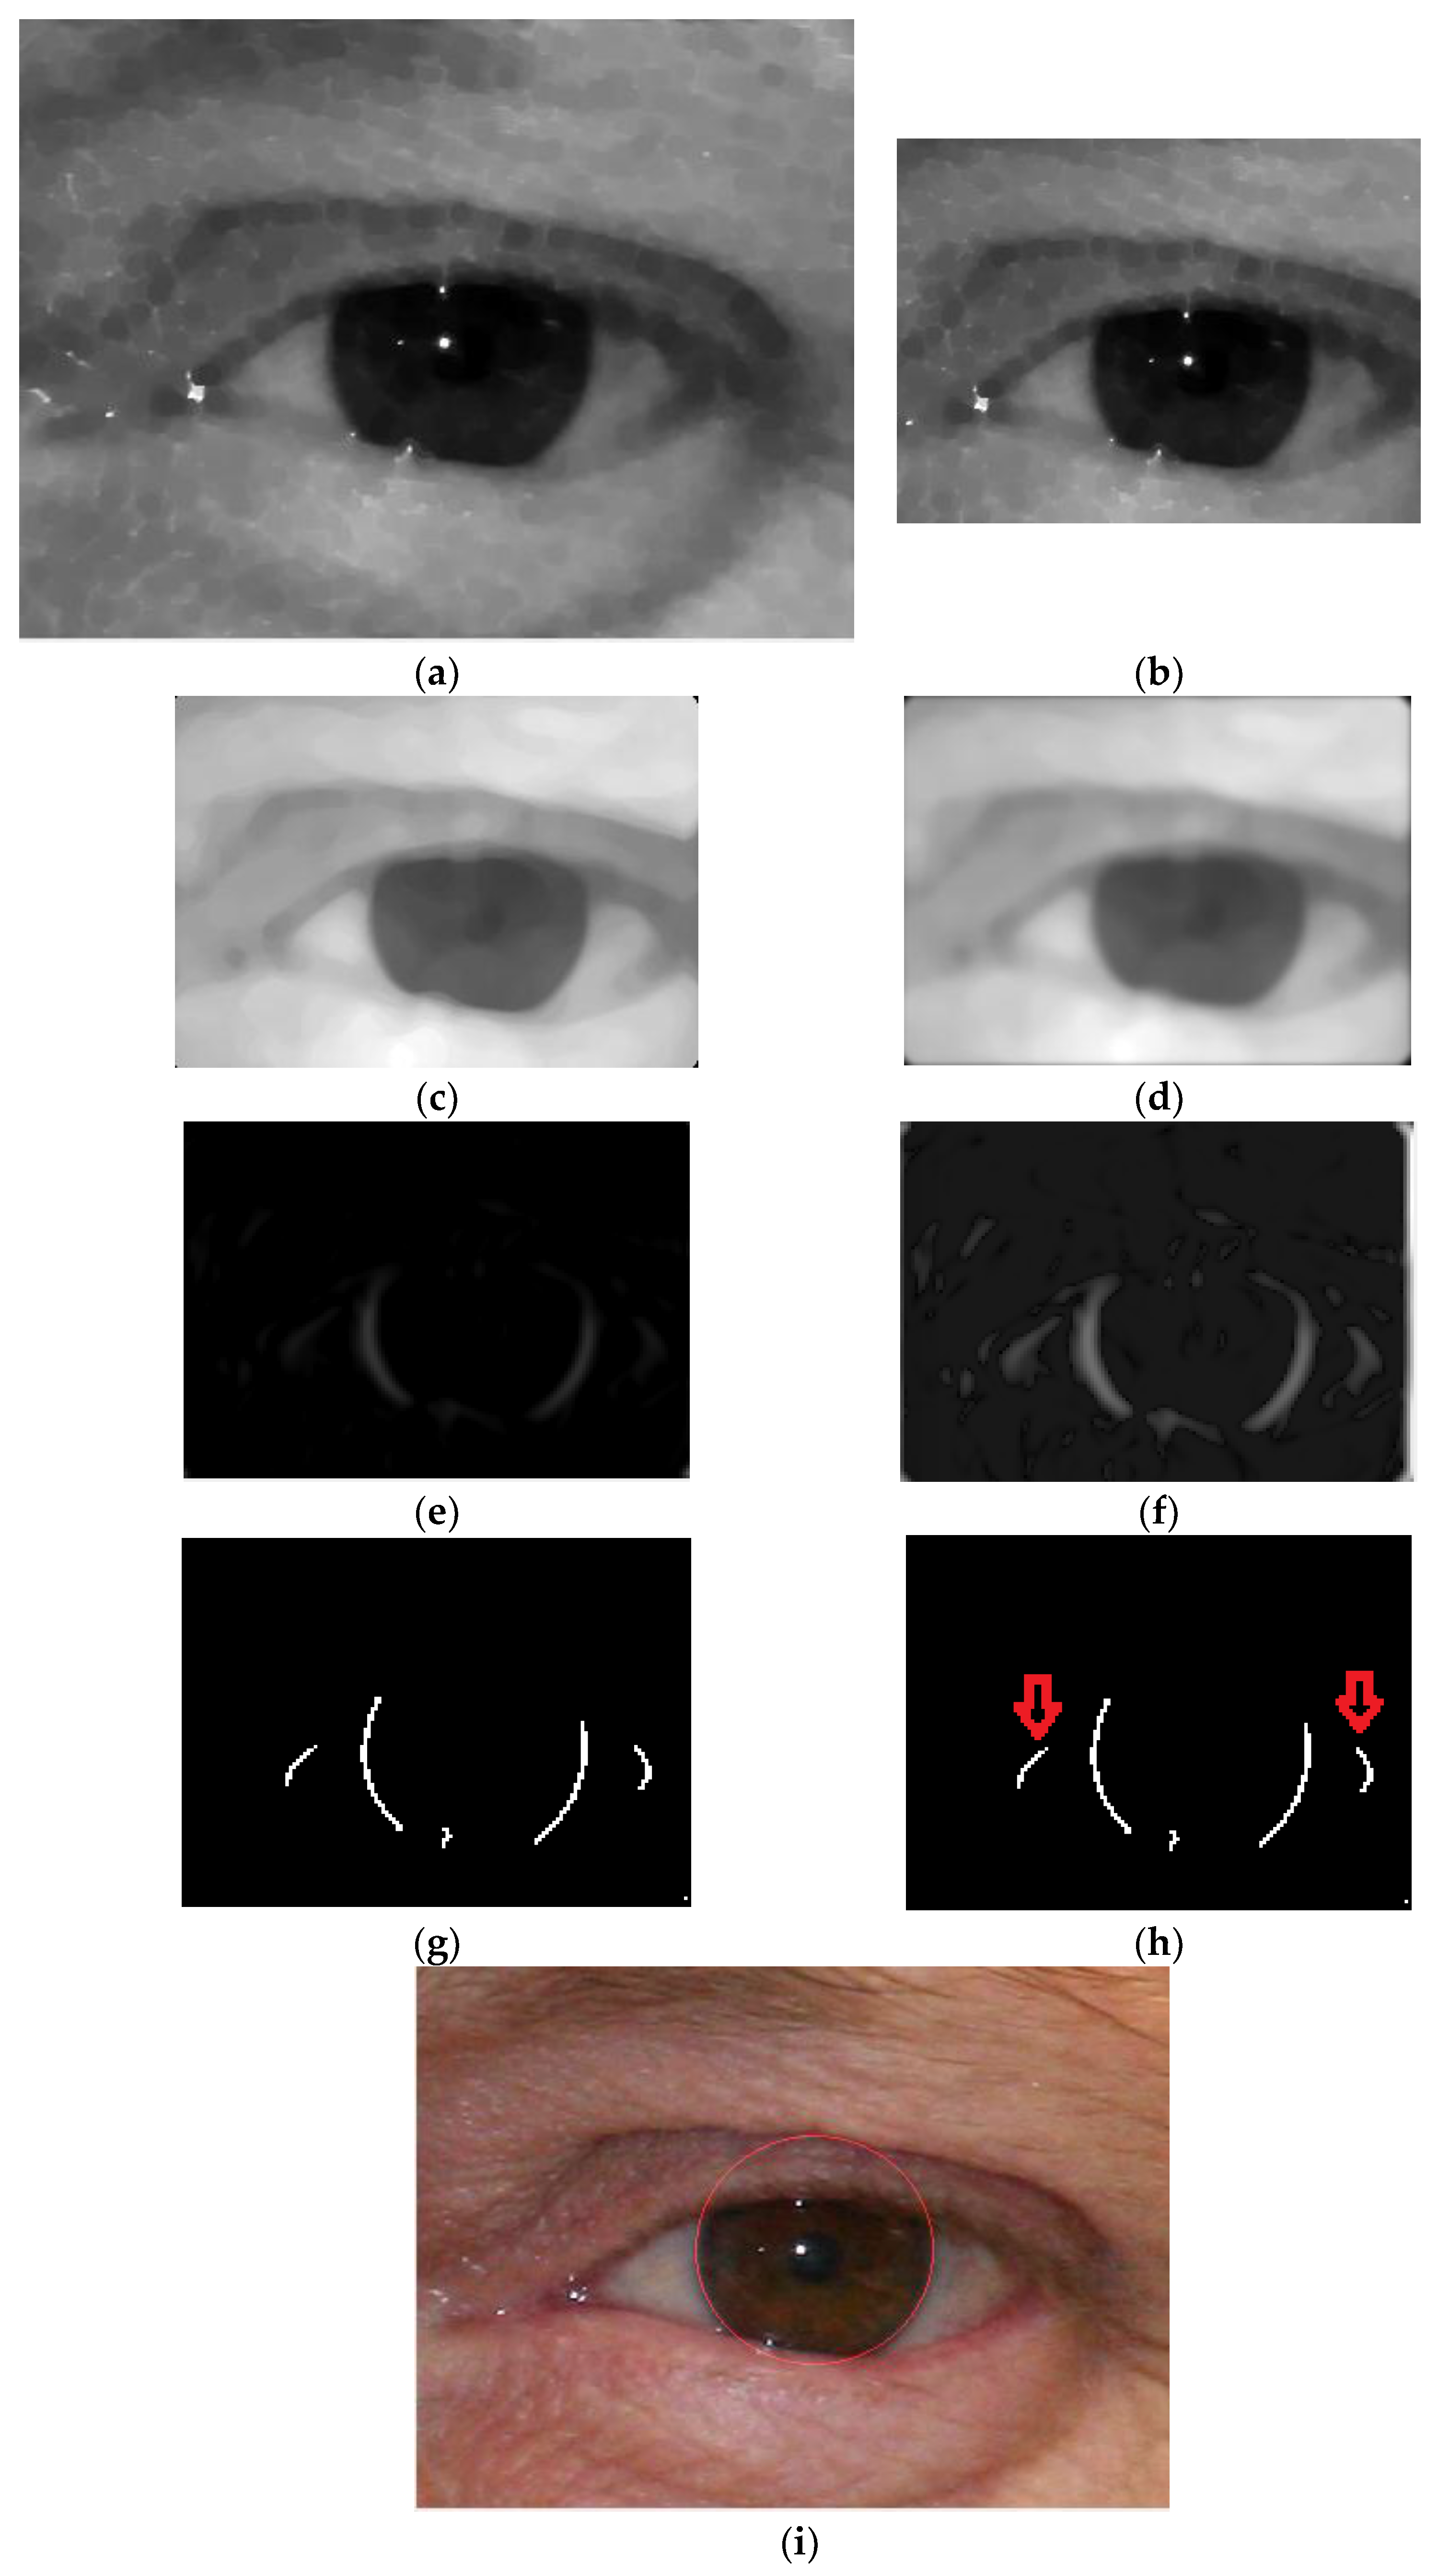 iris segmentation